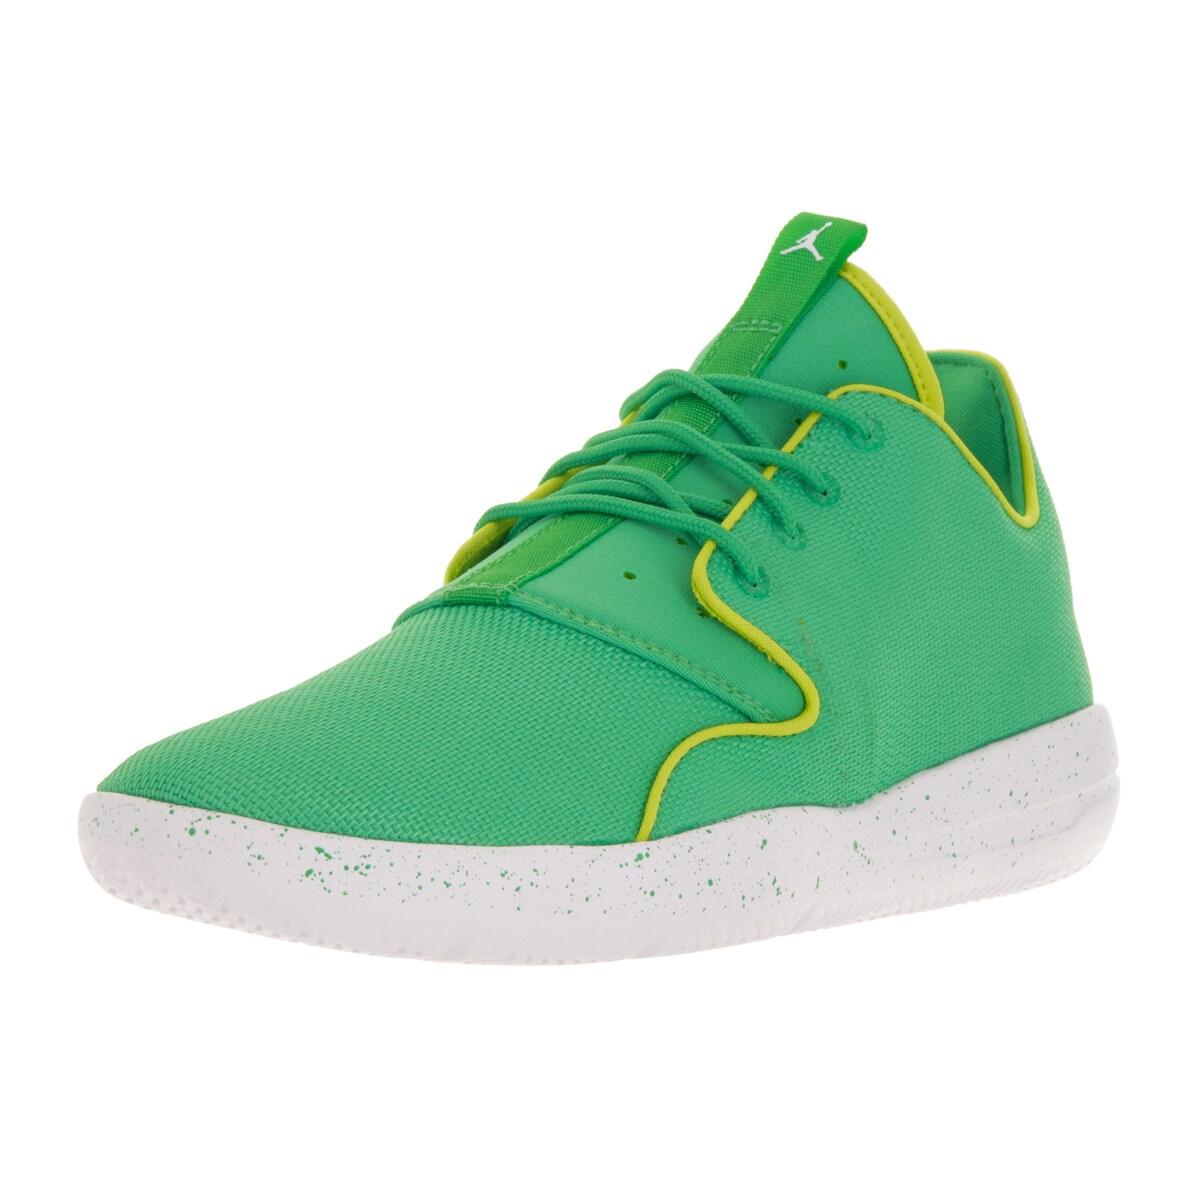 Nike Jordan Kids' Jordan Eclipse Gamma Green and Cyber Wh...